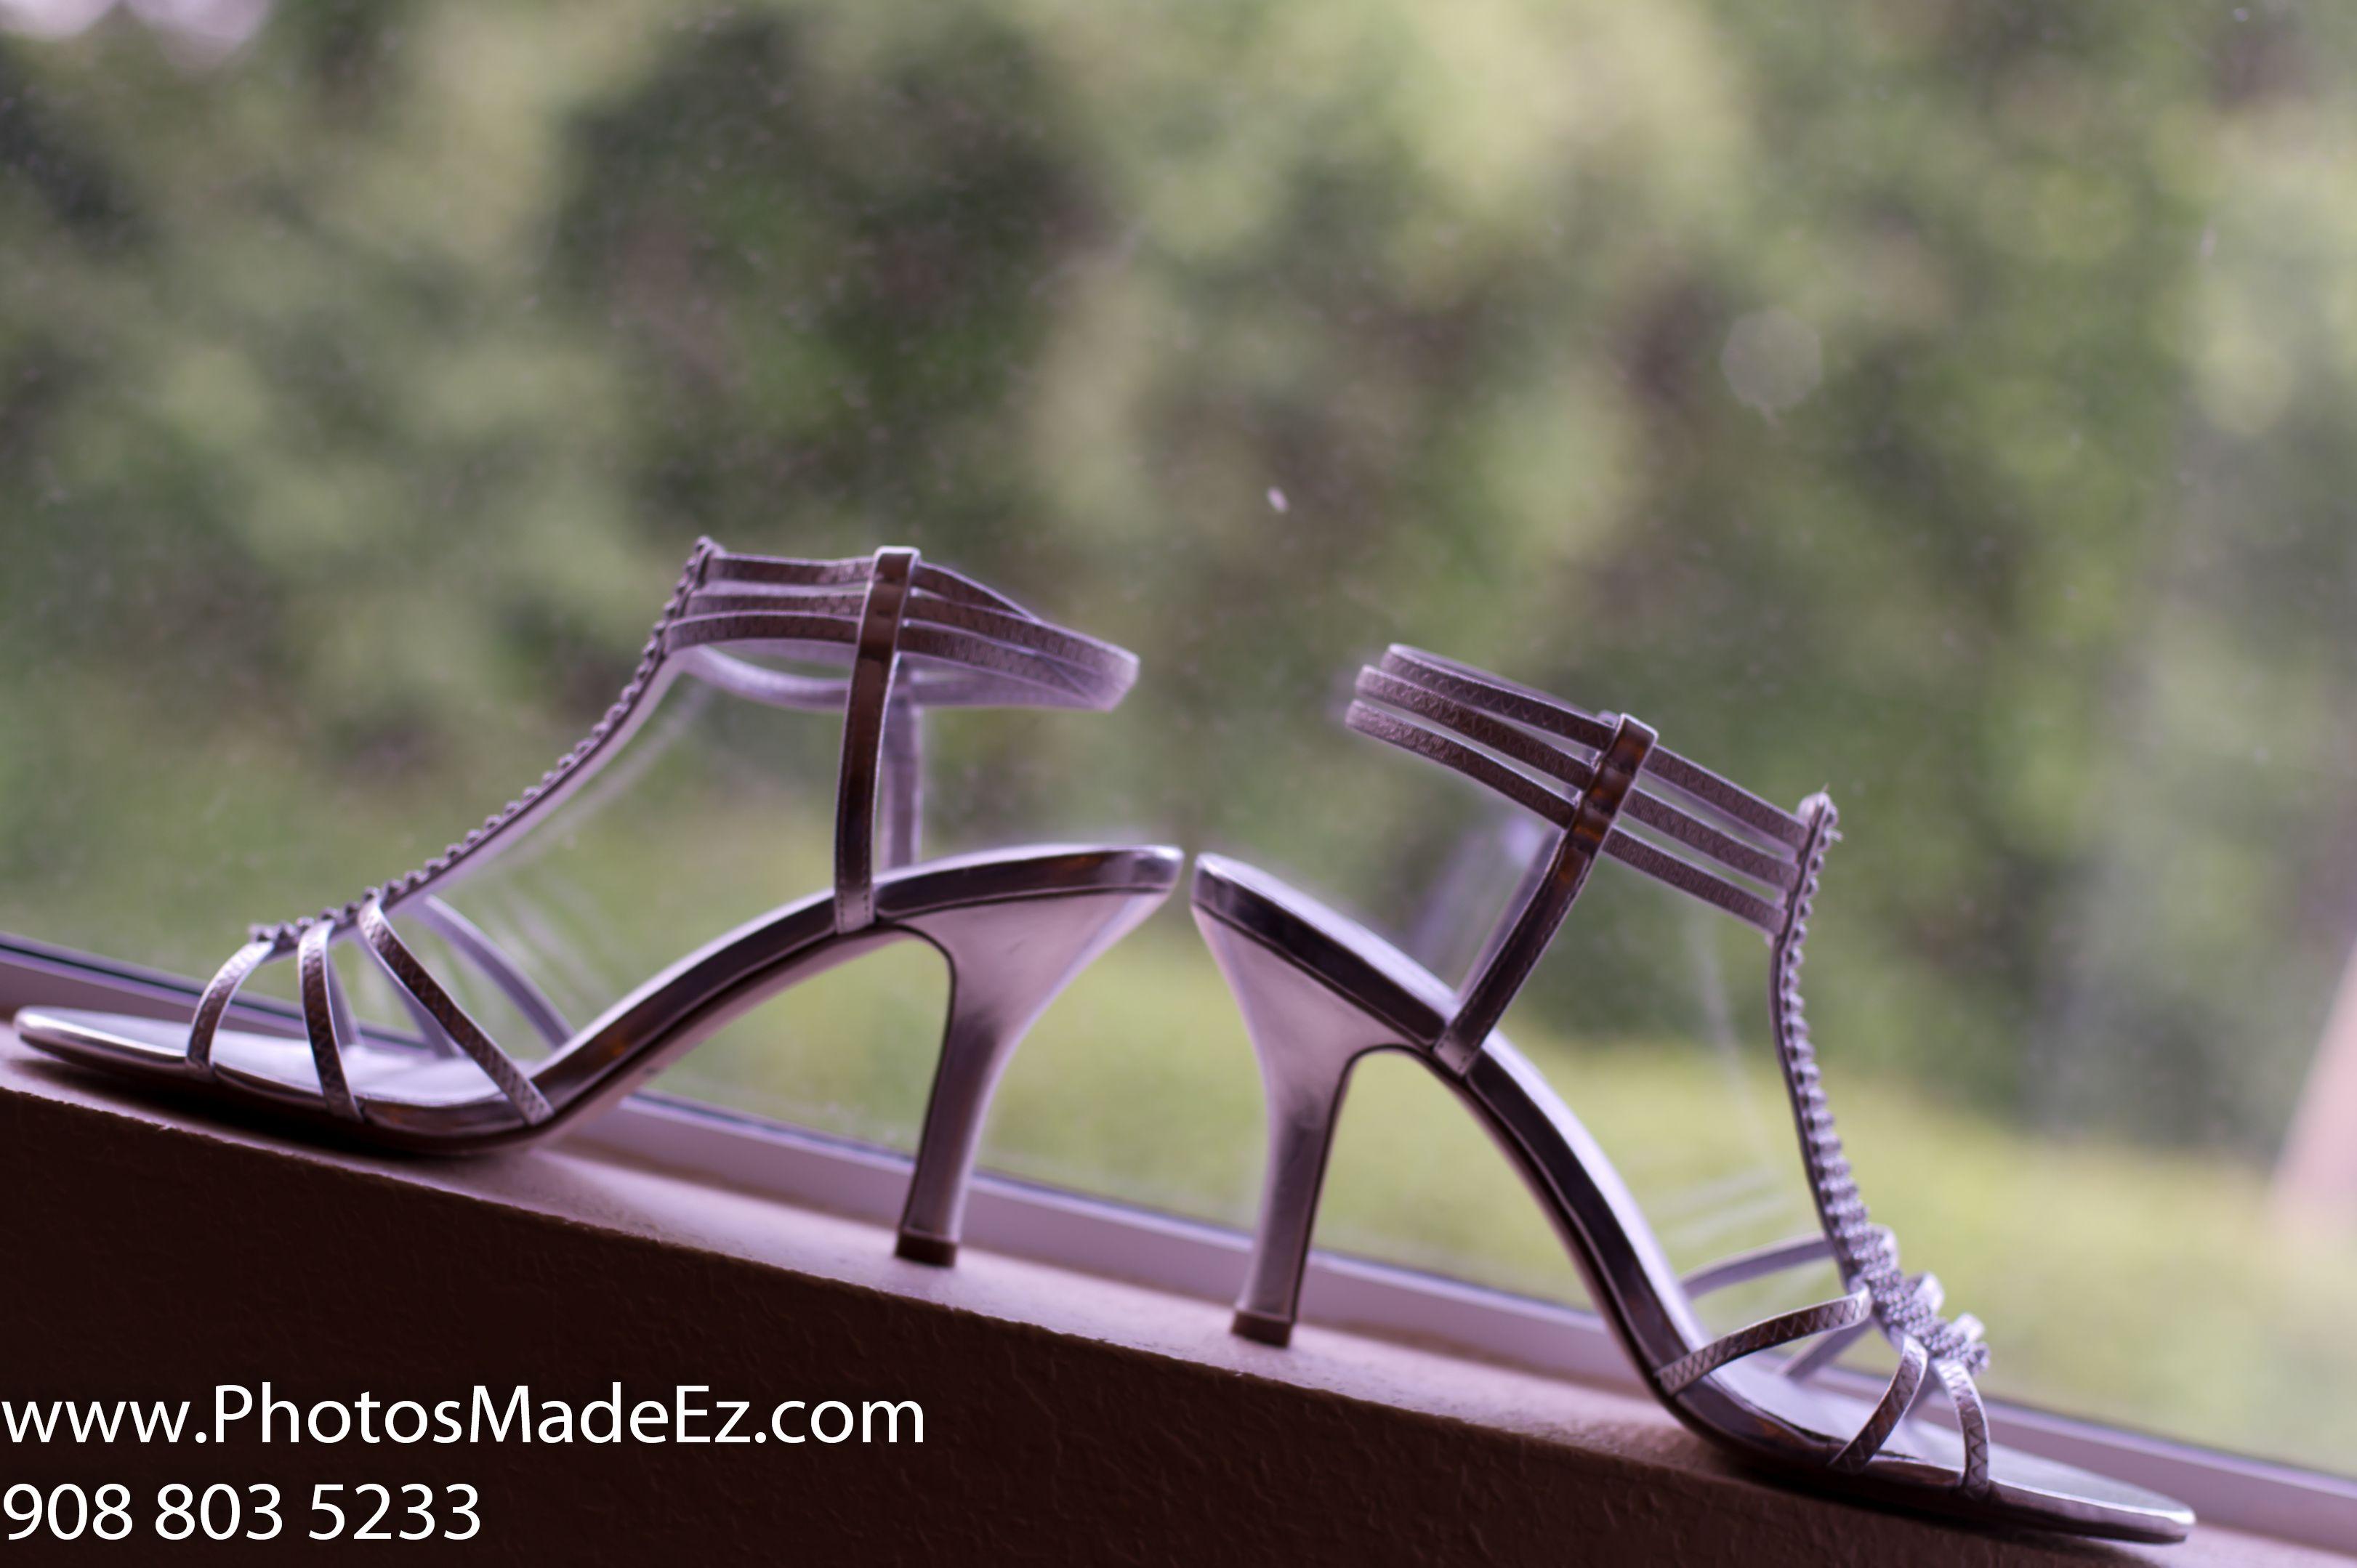 Bride's Shoes, accessories, ring, boquet, chura, clutch, necklace, jewellery jhumka, kalira, payel, bridal makeup, bridal wear earrings, garter, mangalsutra, pagri, groom's turban, groom's cufflink, groom's watch, tika, wedding jewellery,bridal jewellery - Photo by PhotosMadeEz